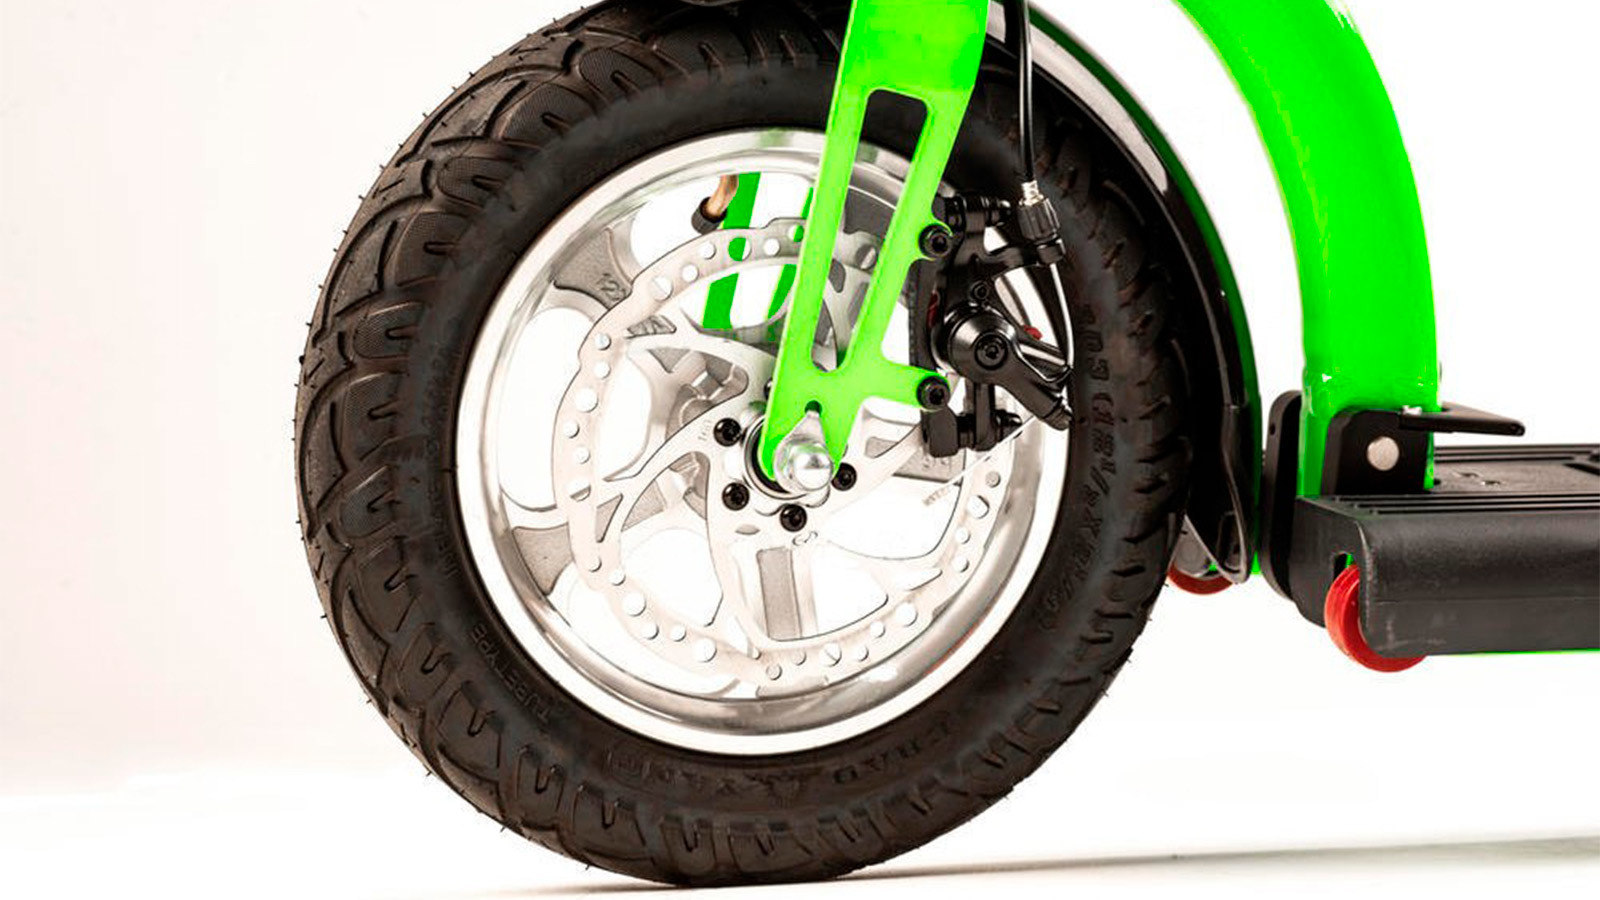 переднее колесо электросамоката